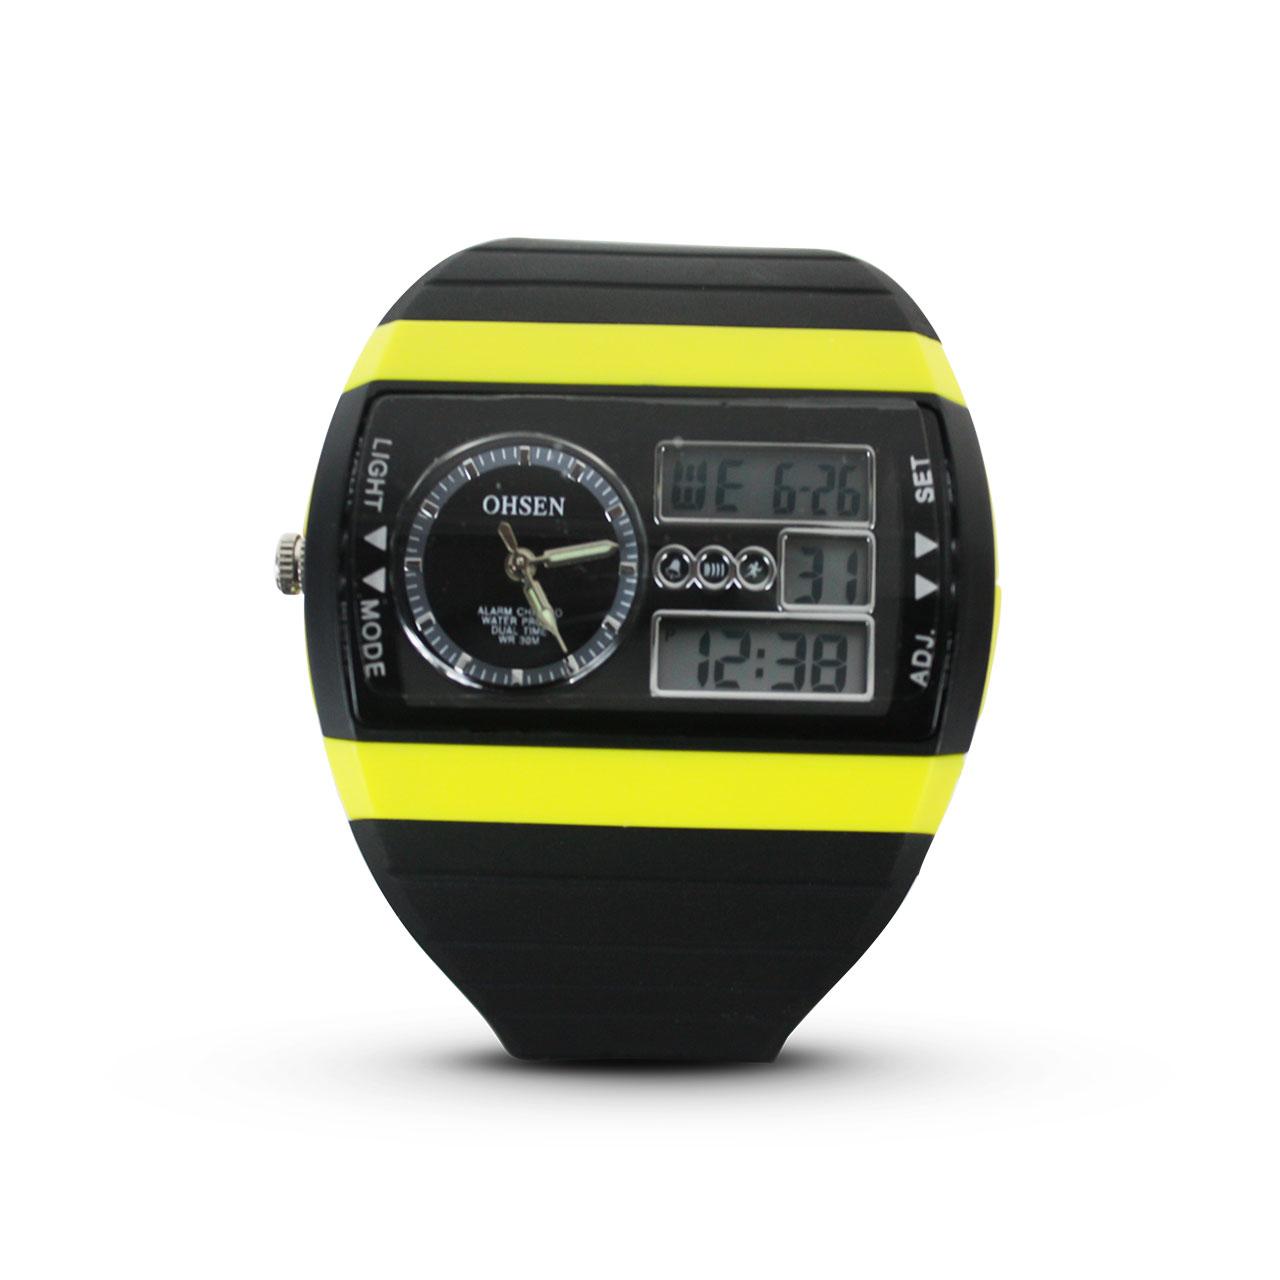 OHSEN Analog Digital Water Resistant Quartz LED 12/24Hrs Sport Rubber Wristwatch